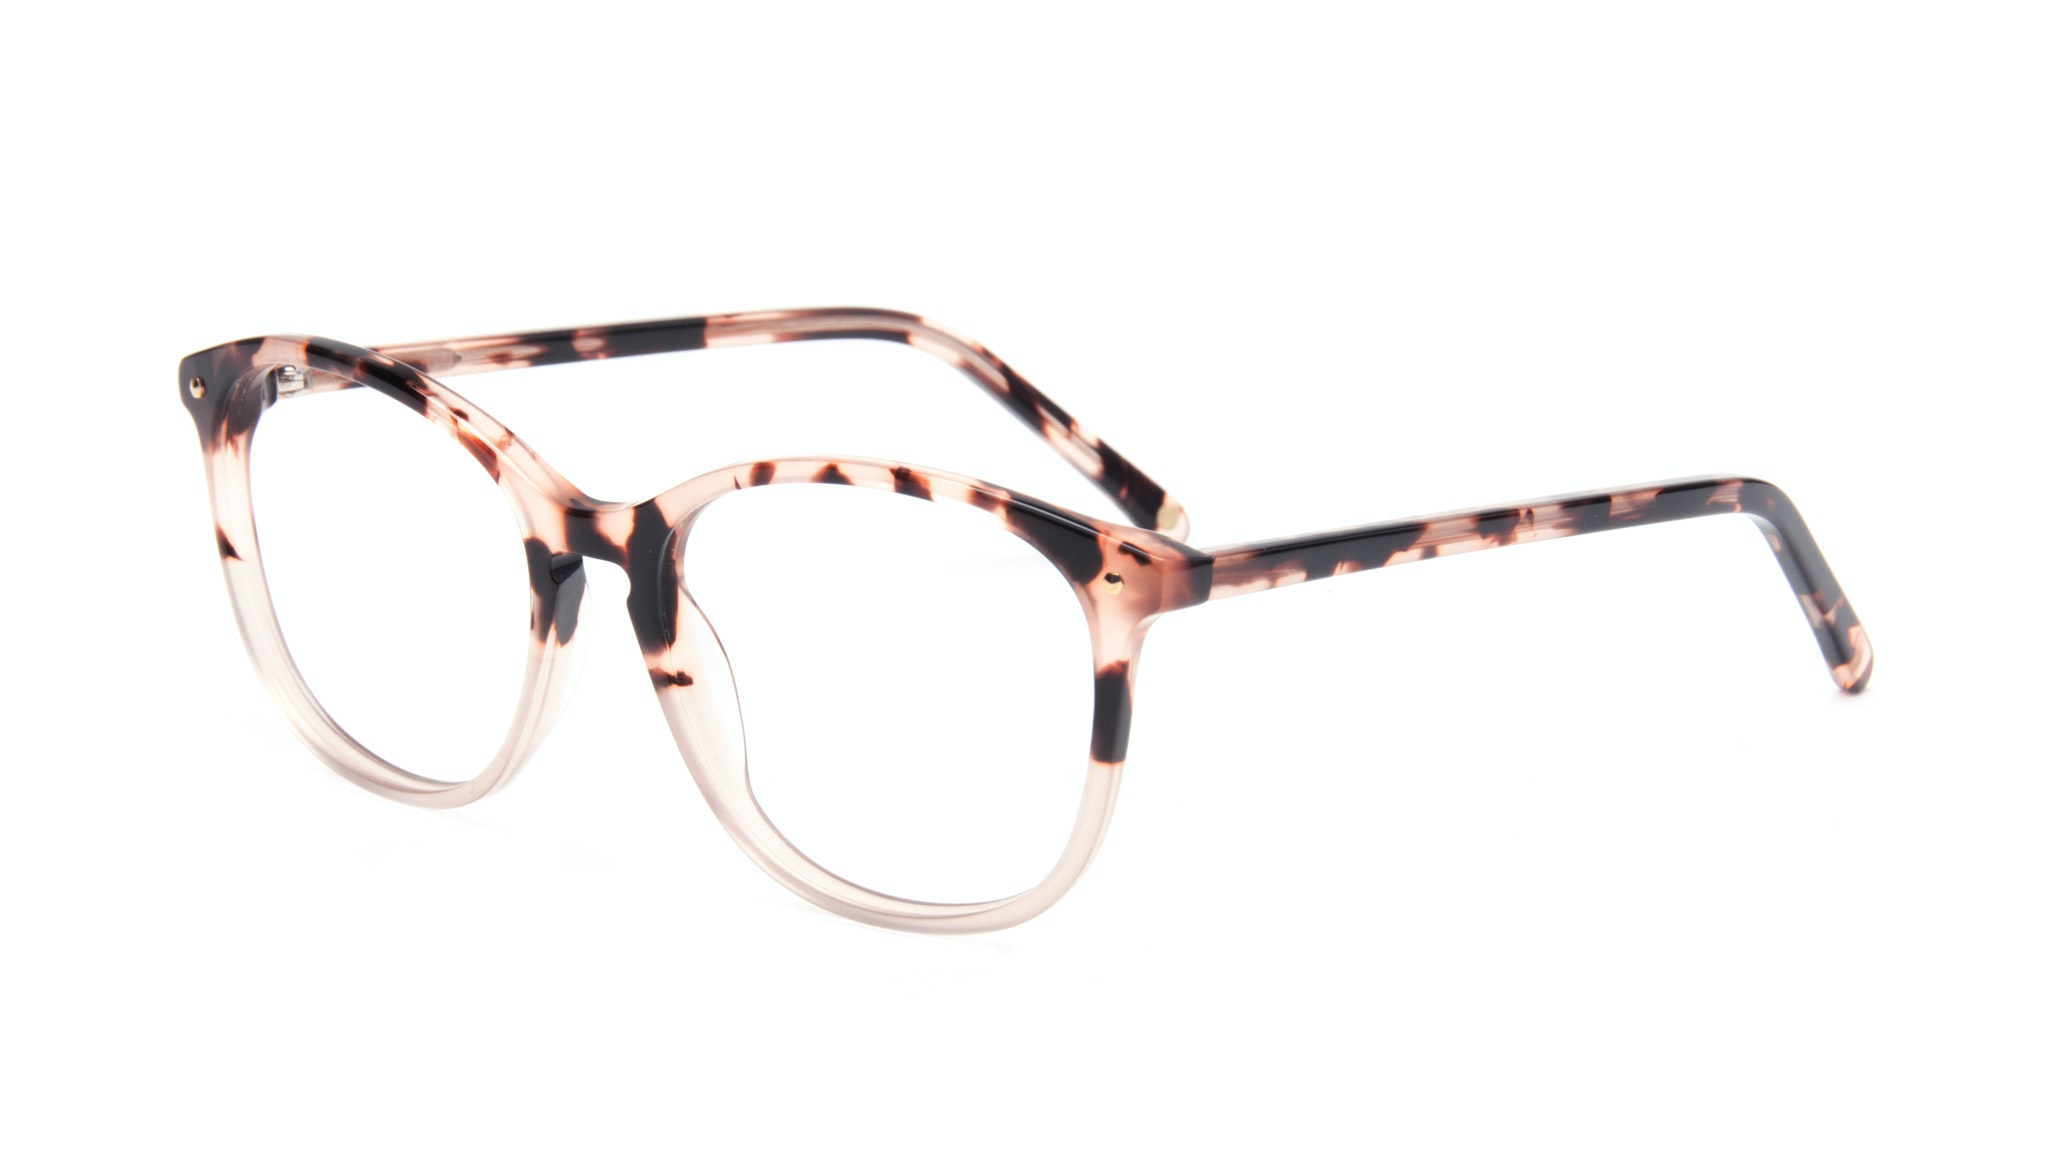 Affordable Fashion Glasses Rectangle Square Round Eyeglasses Women Nadine Two Tone Pink Tilt